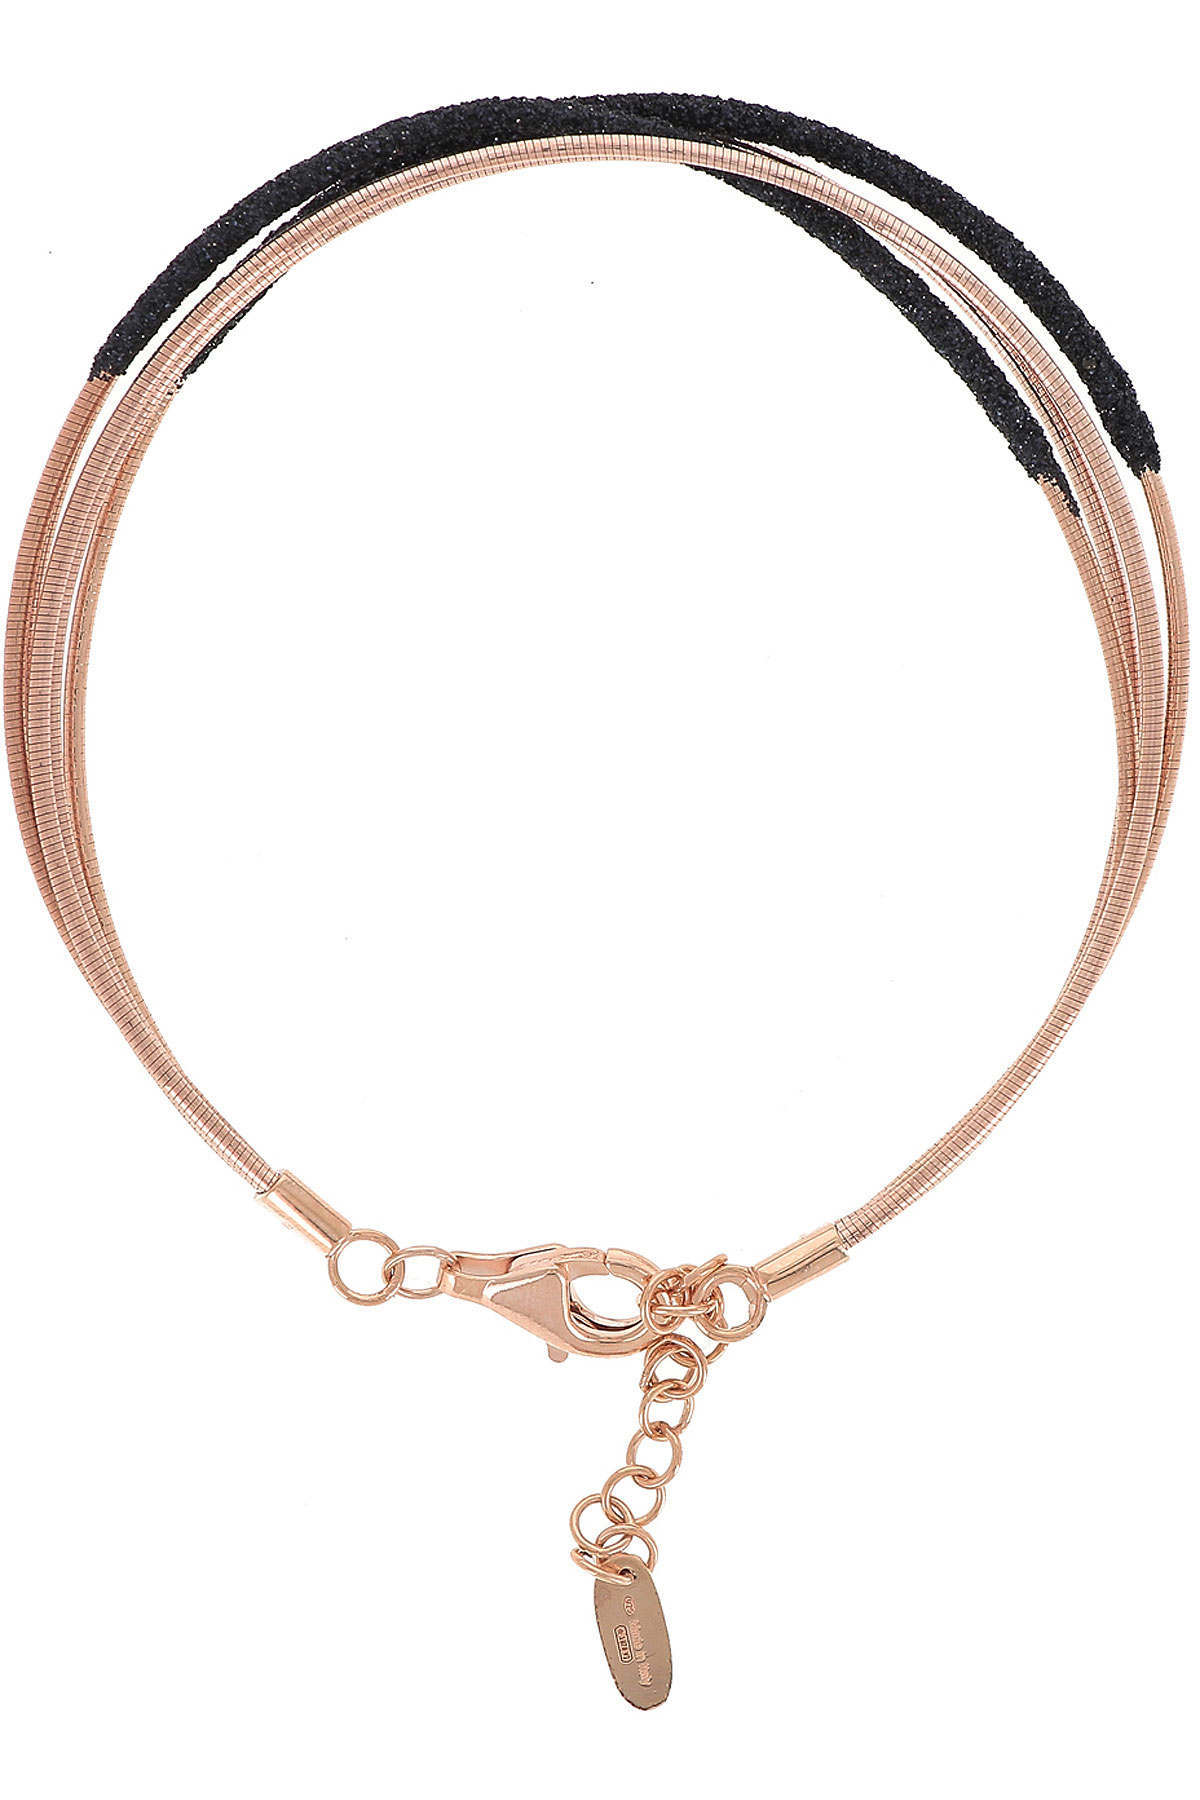 Pesavento Bracelet for Women, Gold Pink, Silver 925, 2019